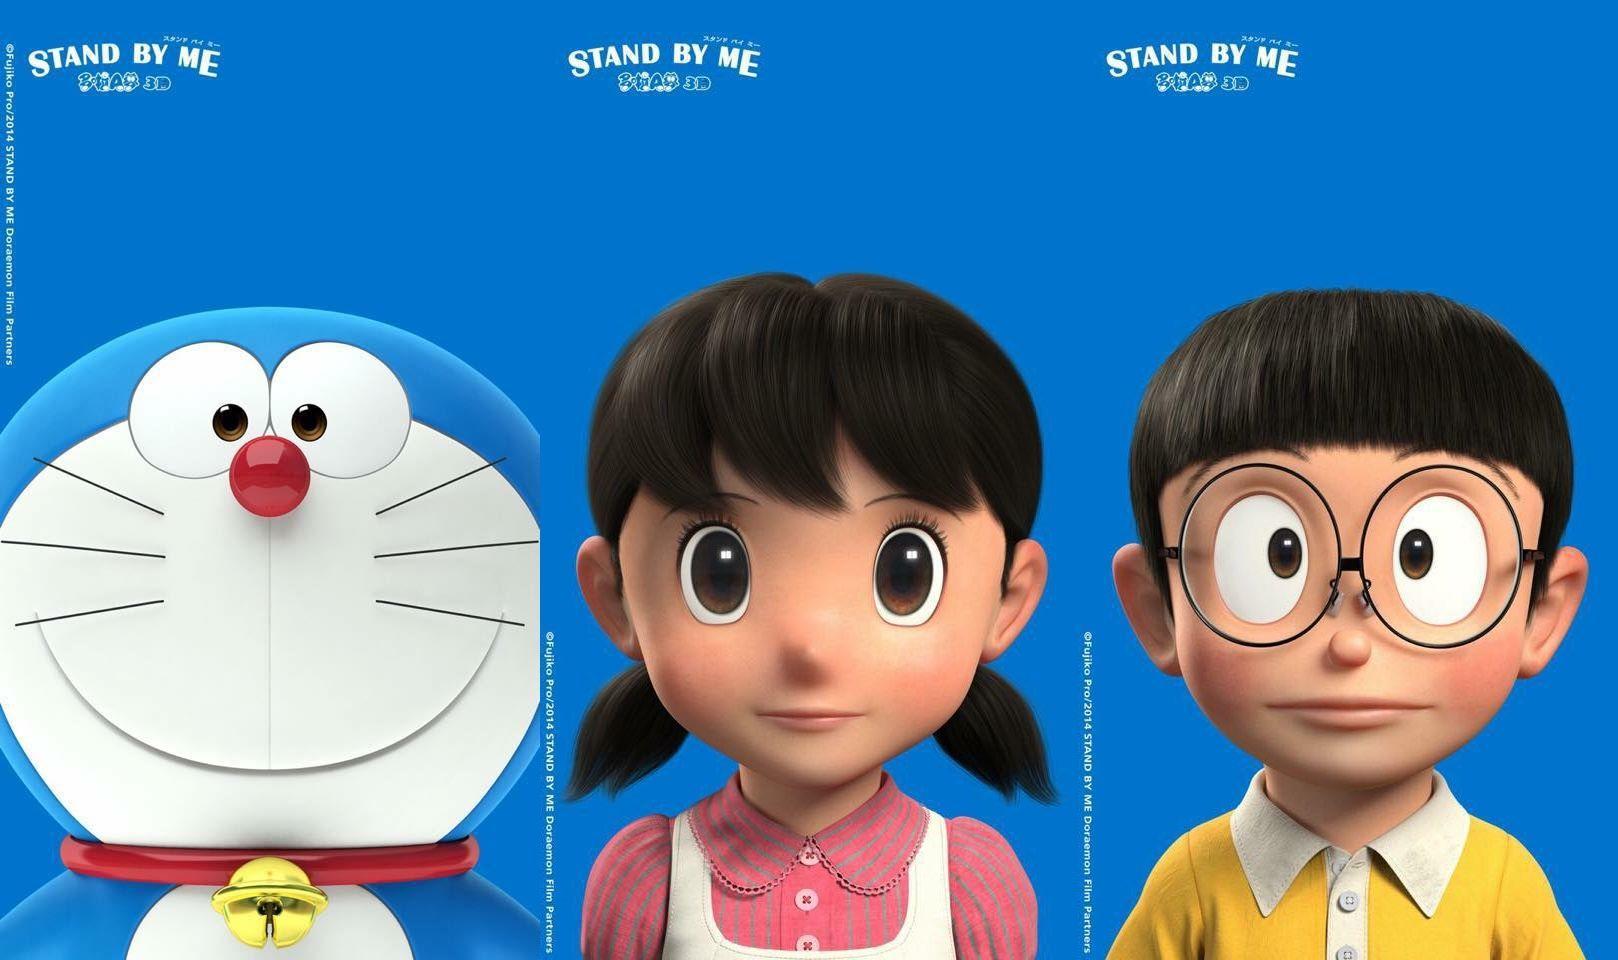 Shizuka Wallpaper 3d Doraemon Stand By Me Wallpapers Wallpaper Cave